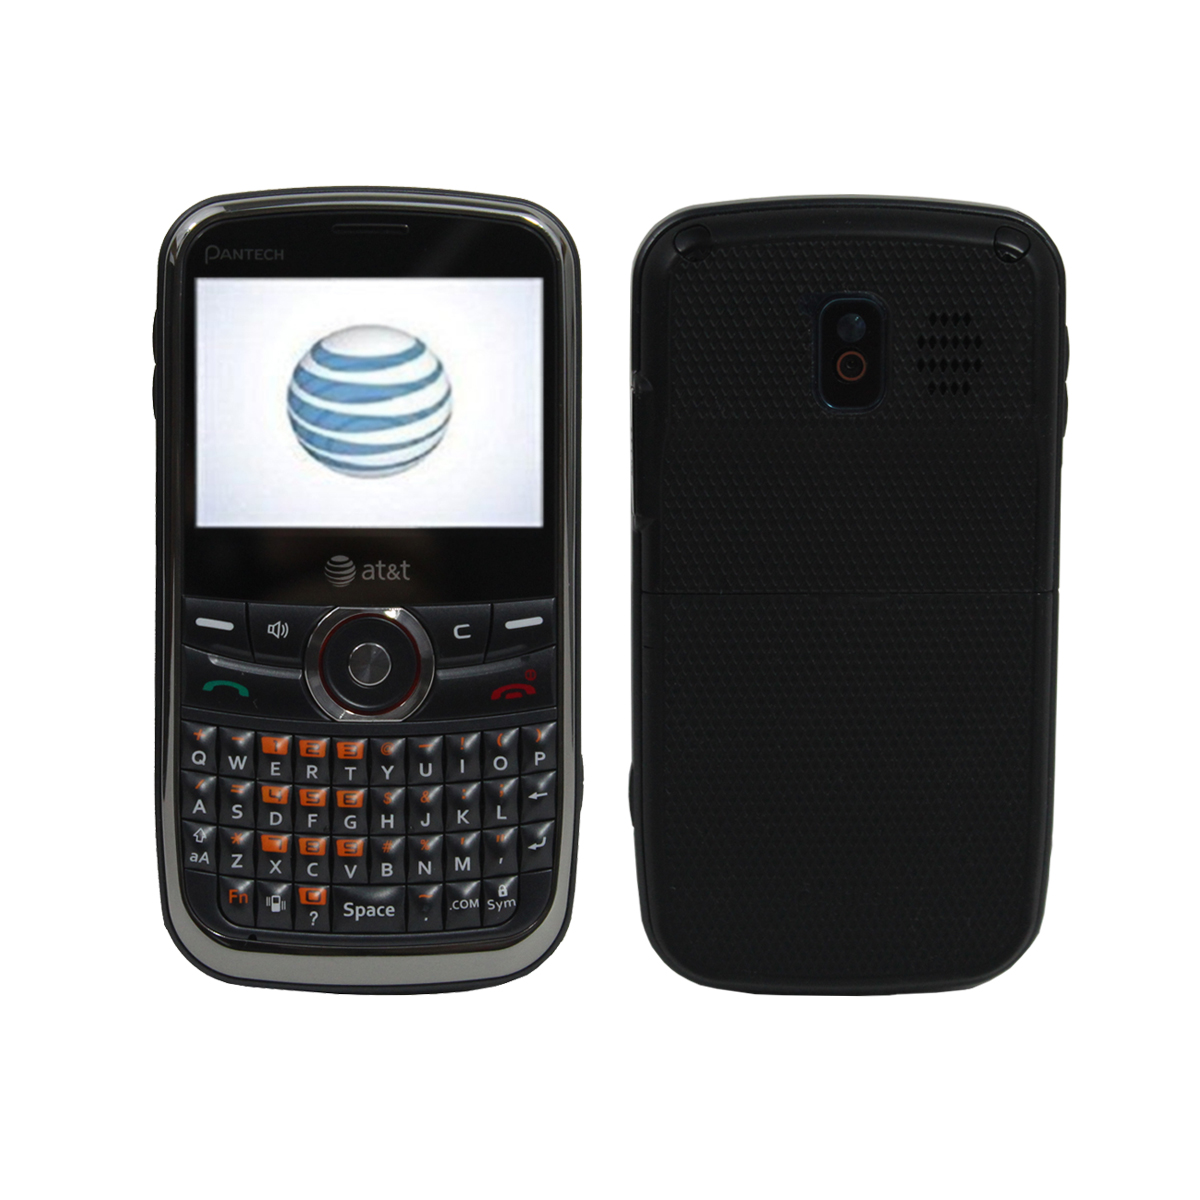 Pantech Link P7040 At T Gsm Unlocked Qwerty Keyboard Phone Gray Wine Ebay